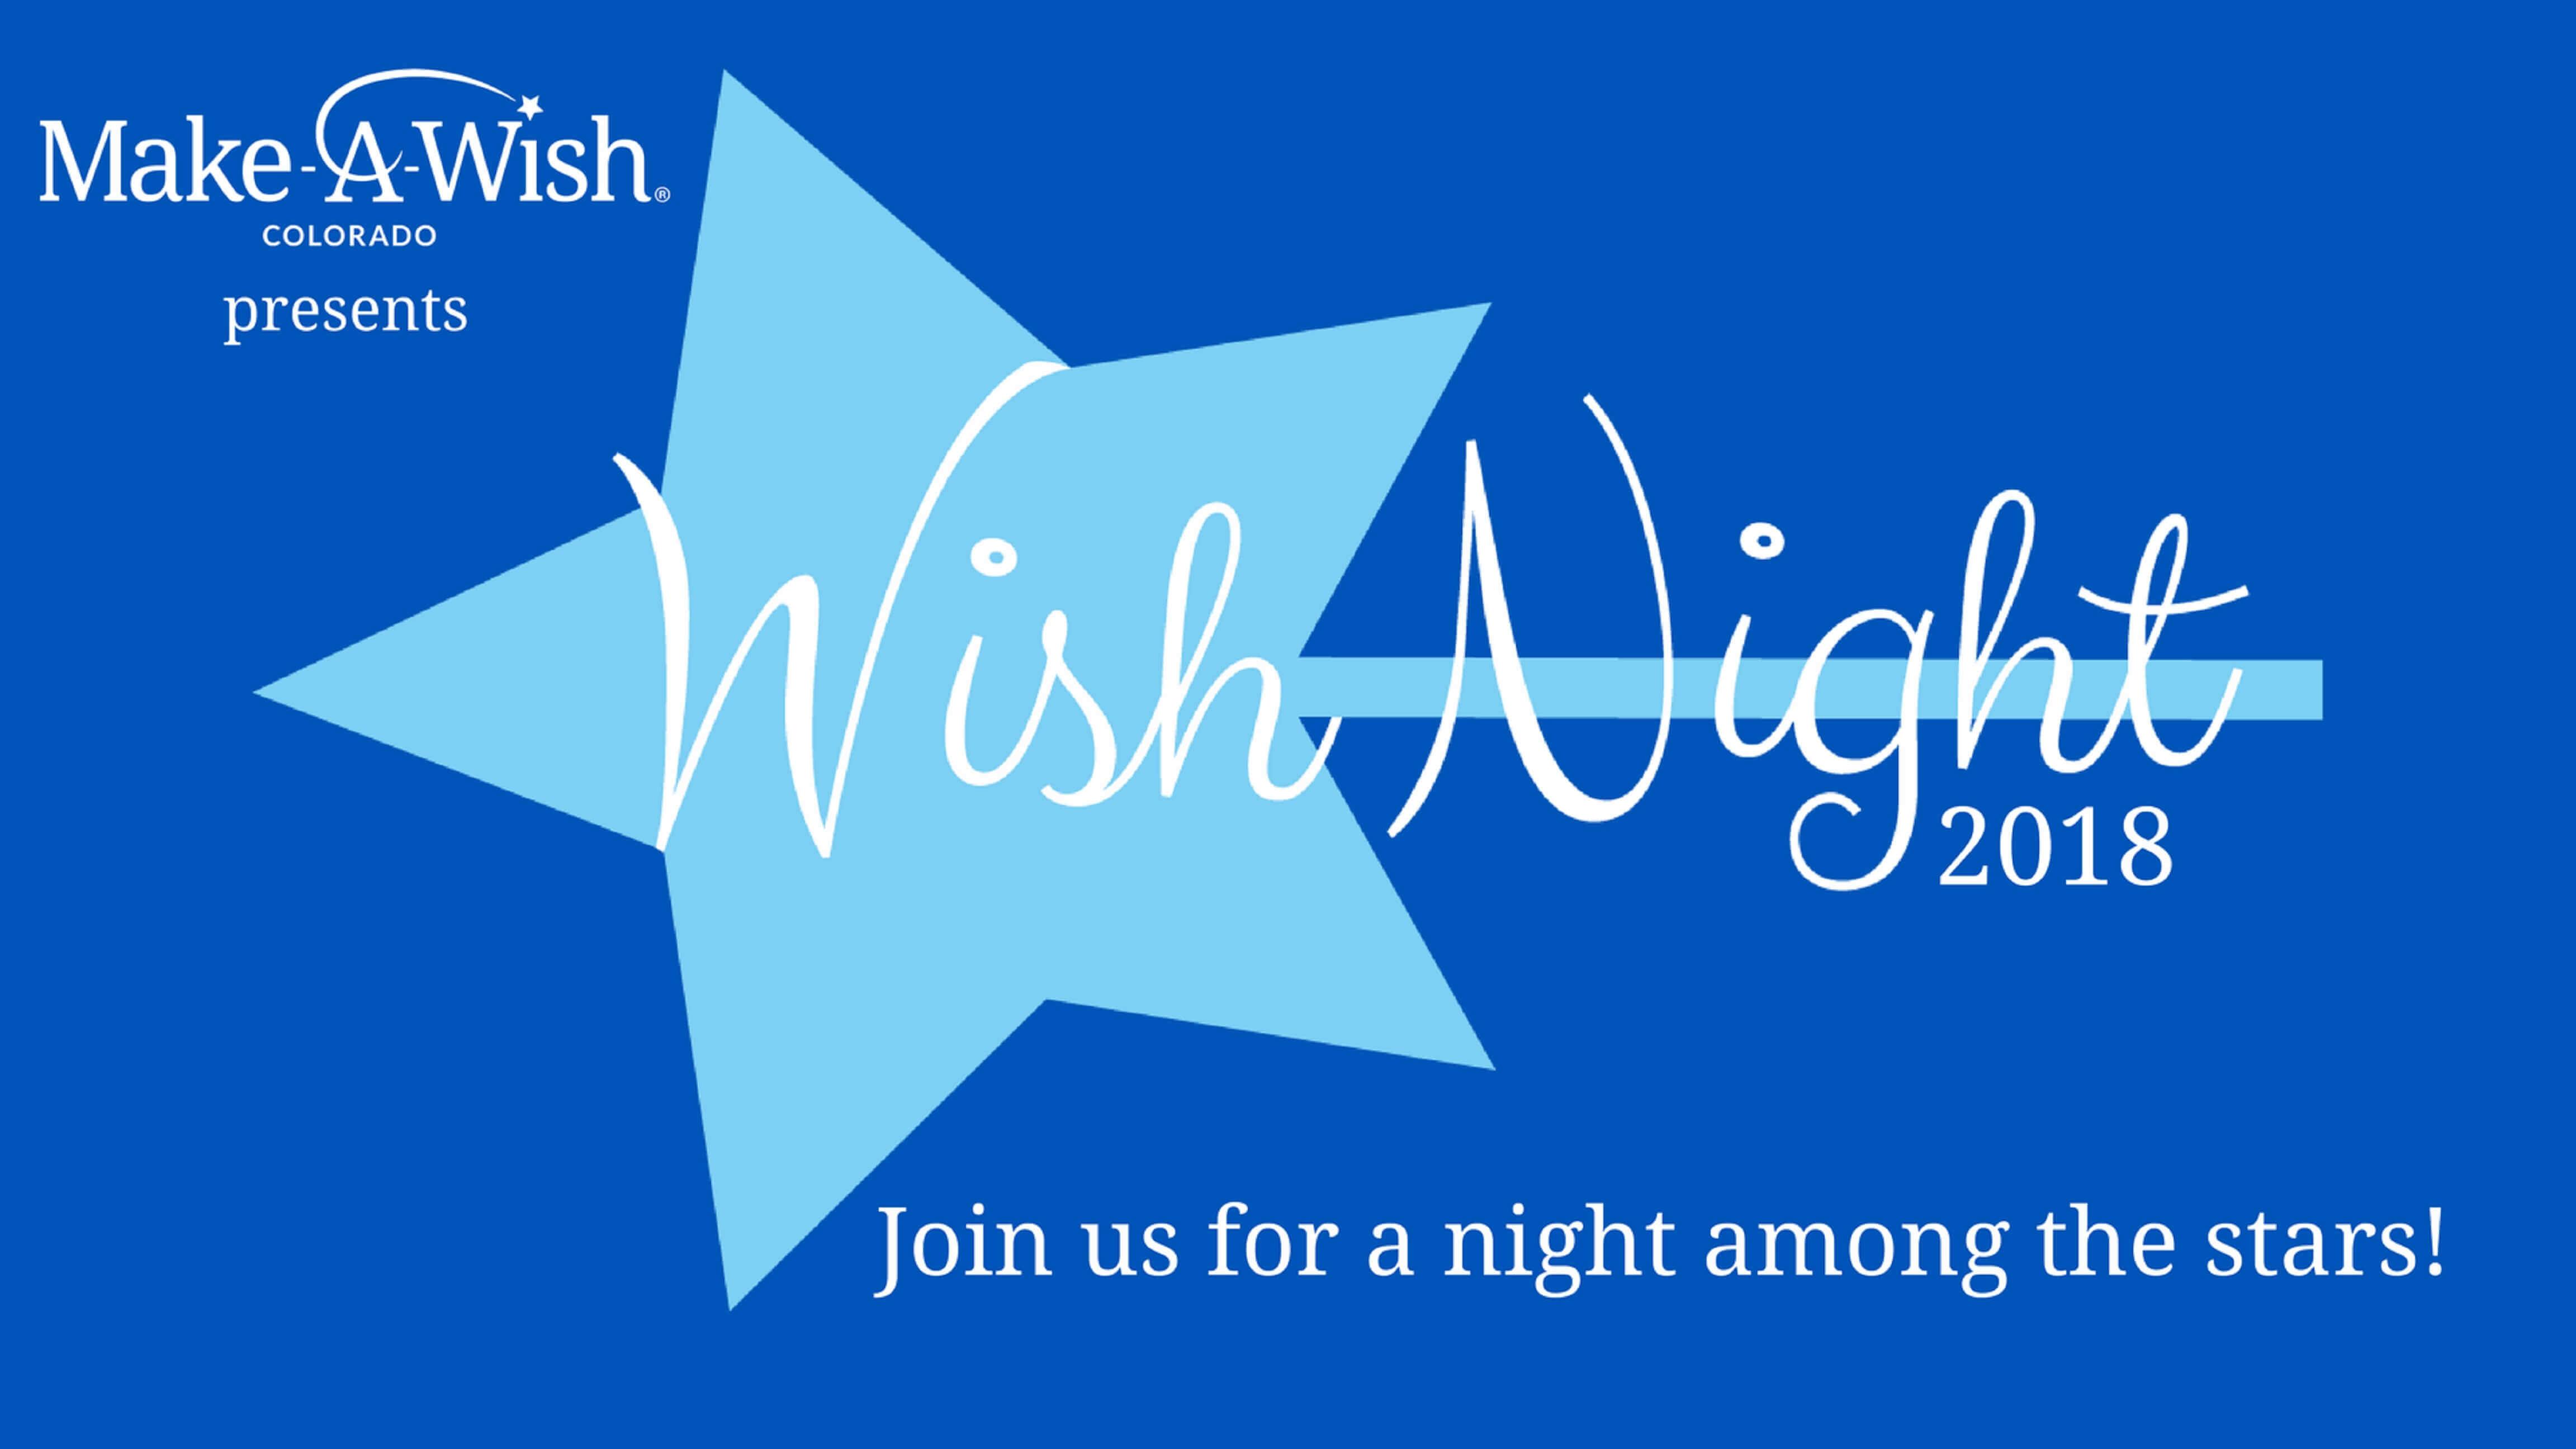 Make-a-wish Colorado - mobile fundraising